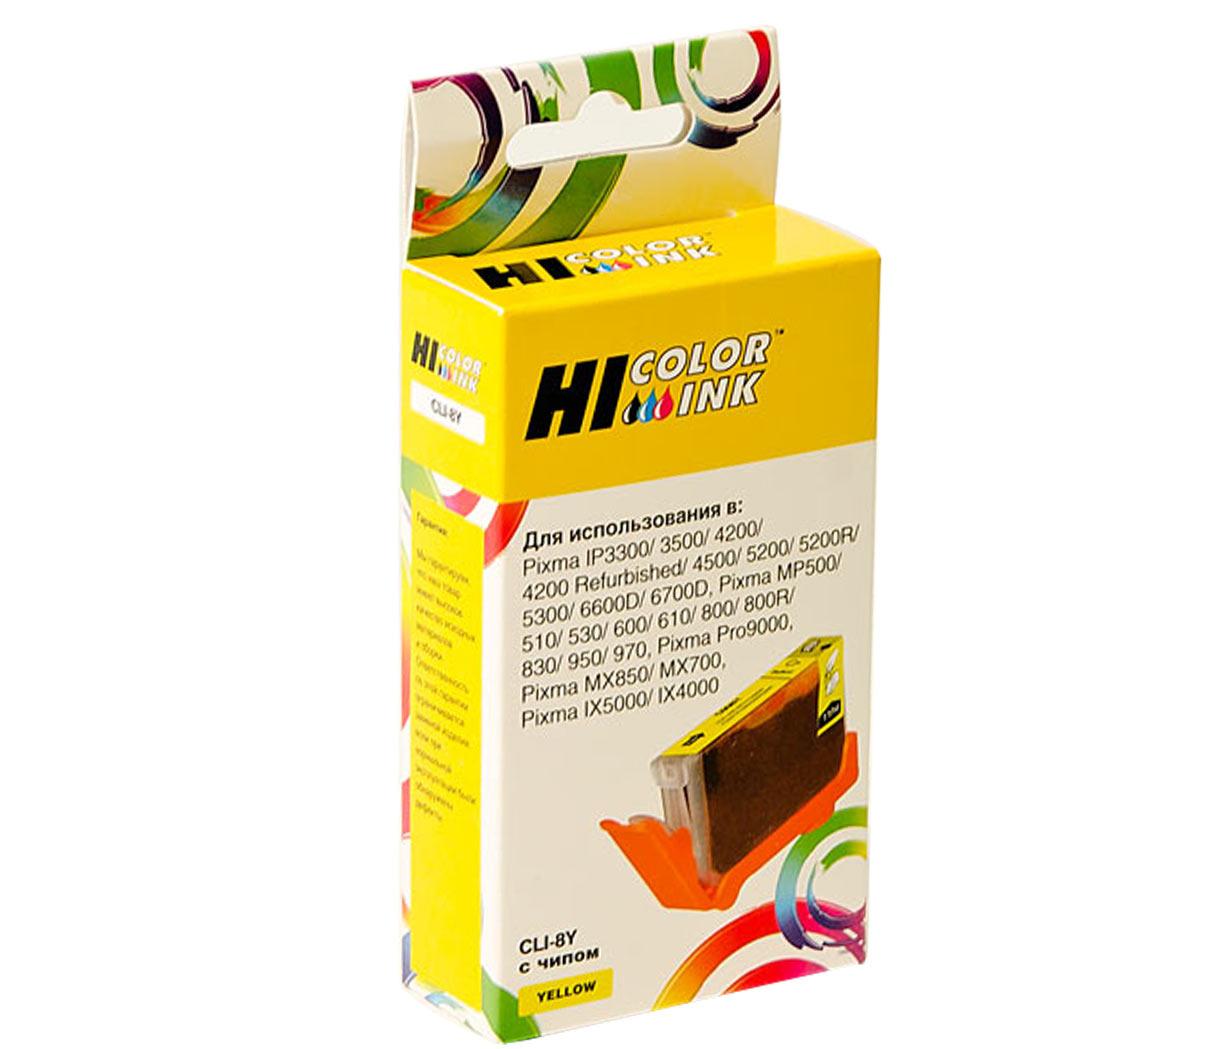 Картридж Hi-Black (HB-CLI-8Y) для Canon PIXMA iP4200/iP6600D/MP500, Y